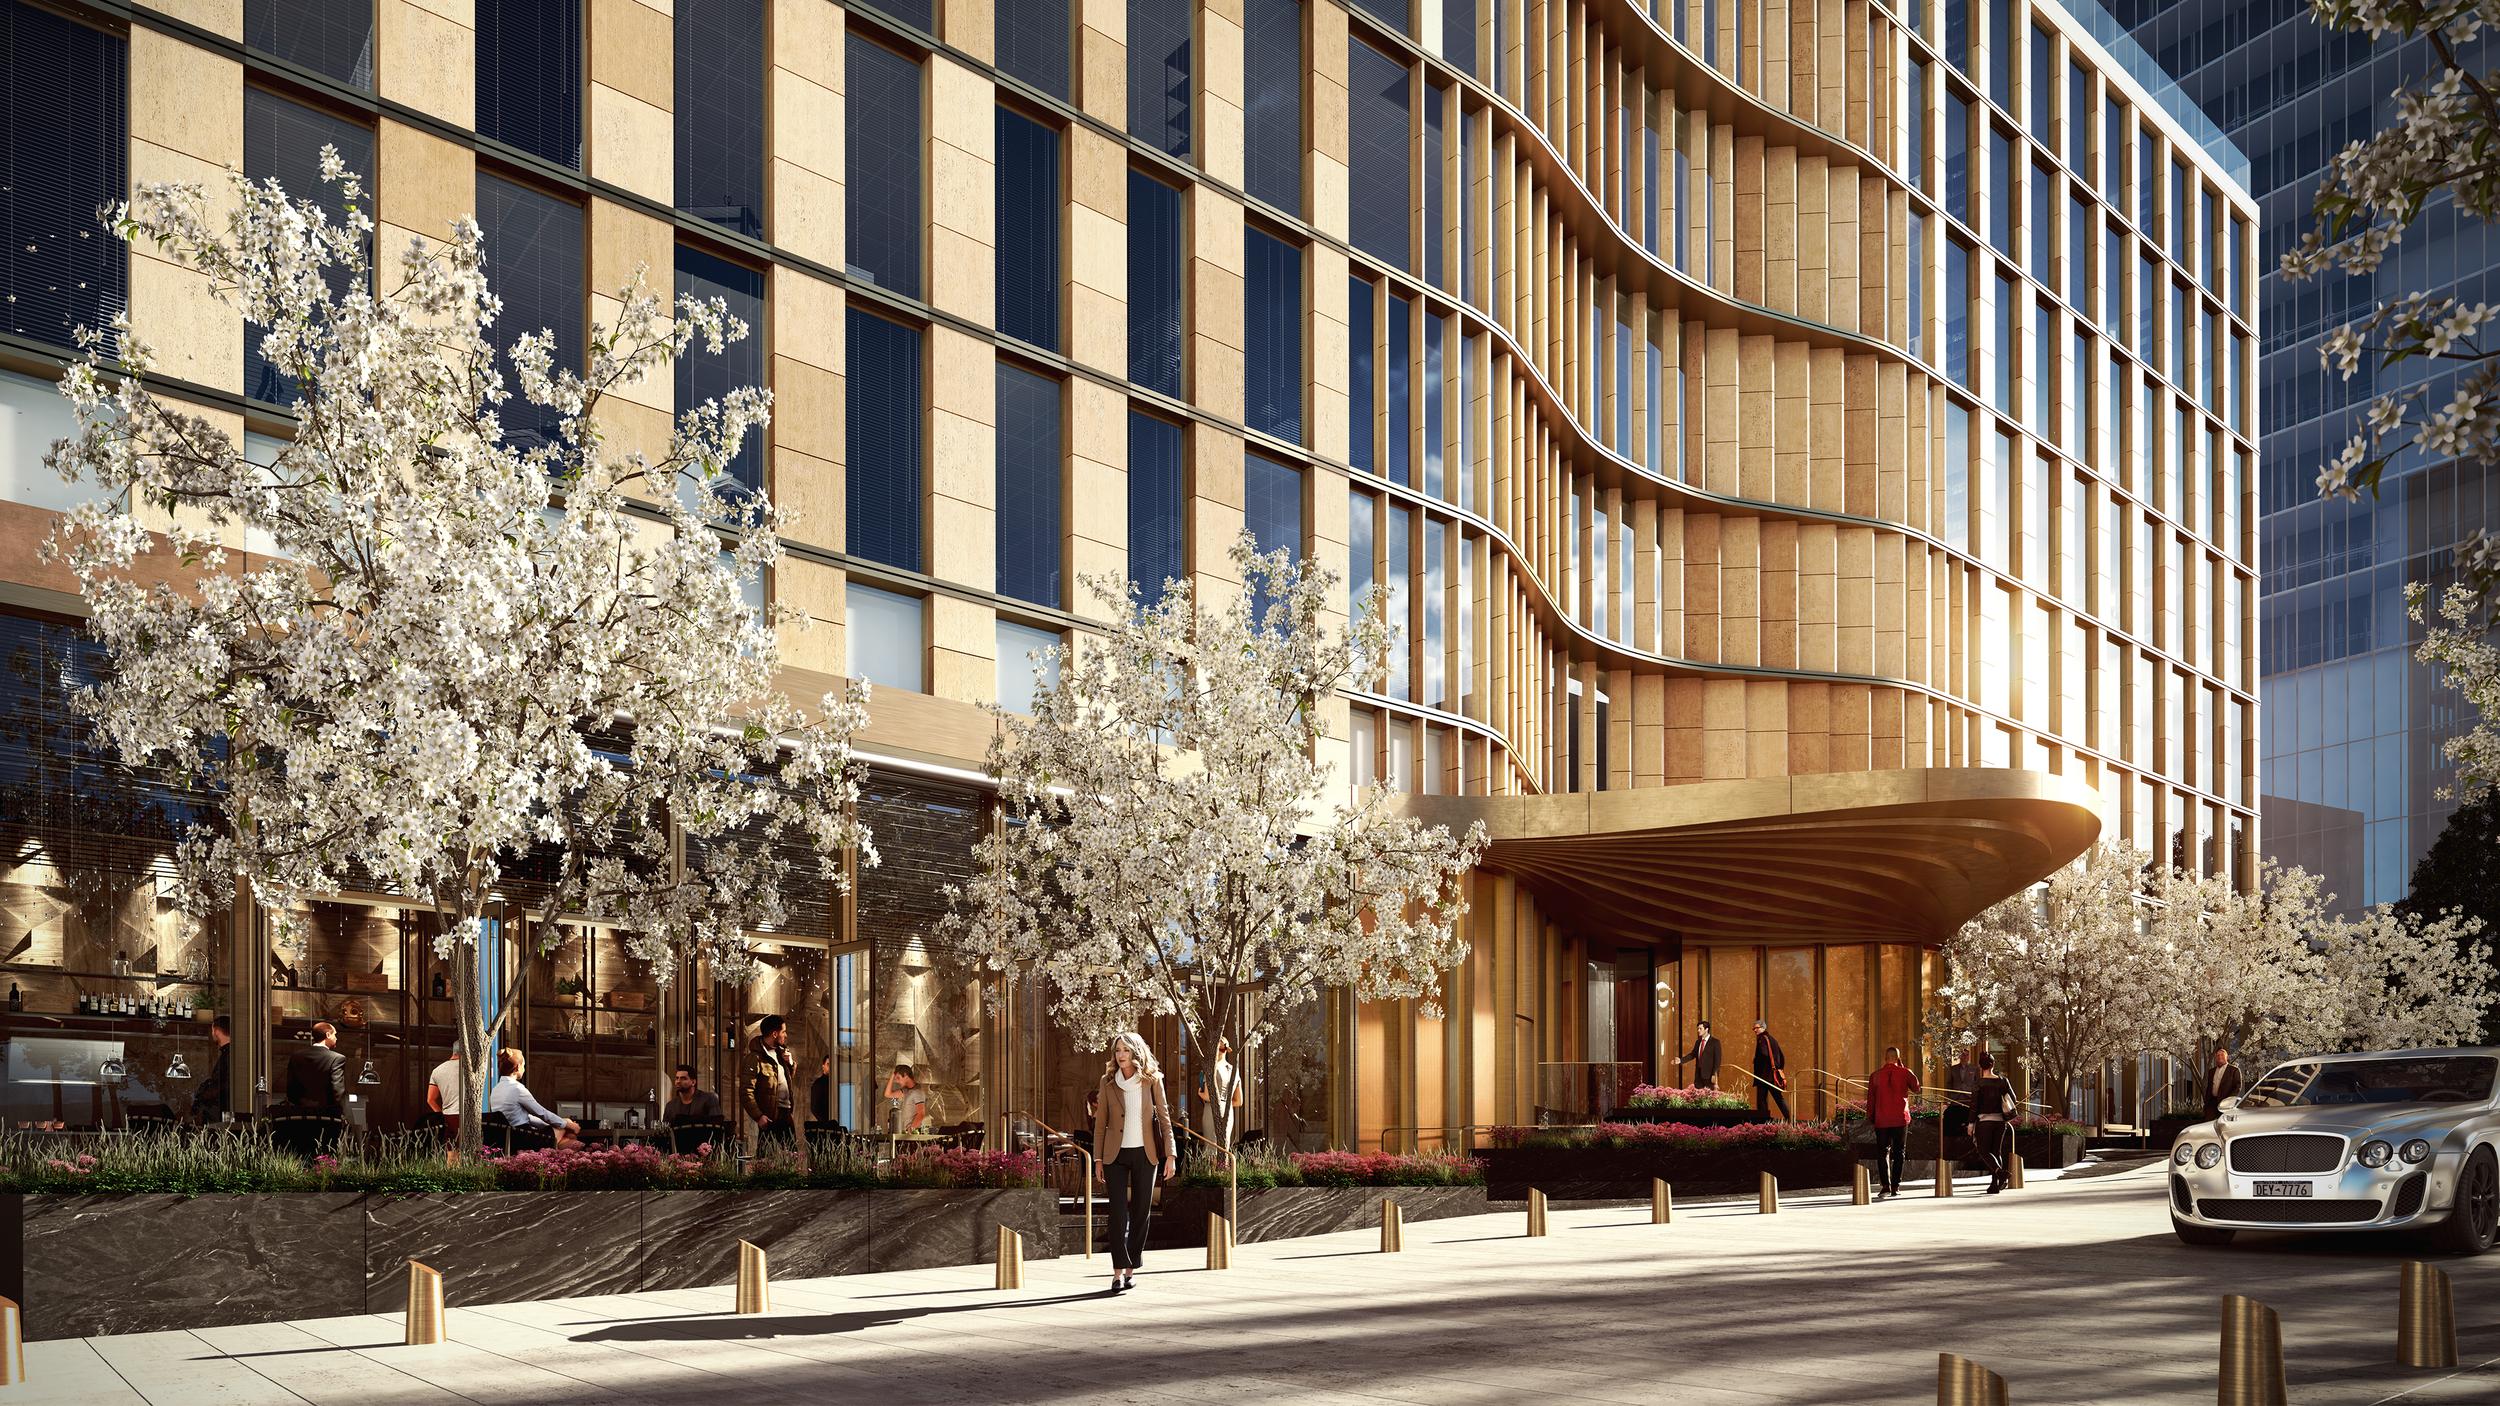 Hudson Yards Reveals The Neighborhoods Highest Residences In Boutique Offering At 35 Hudson Yards